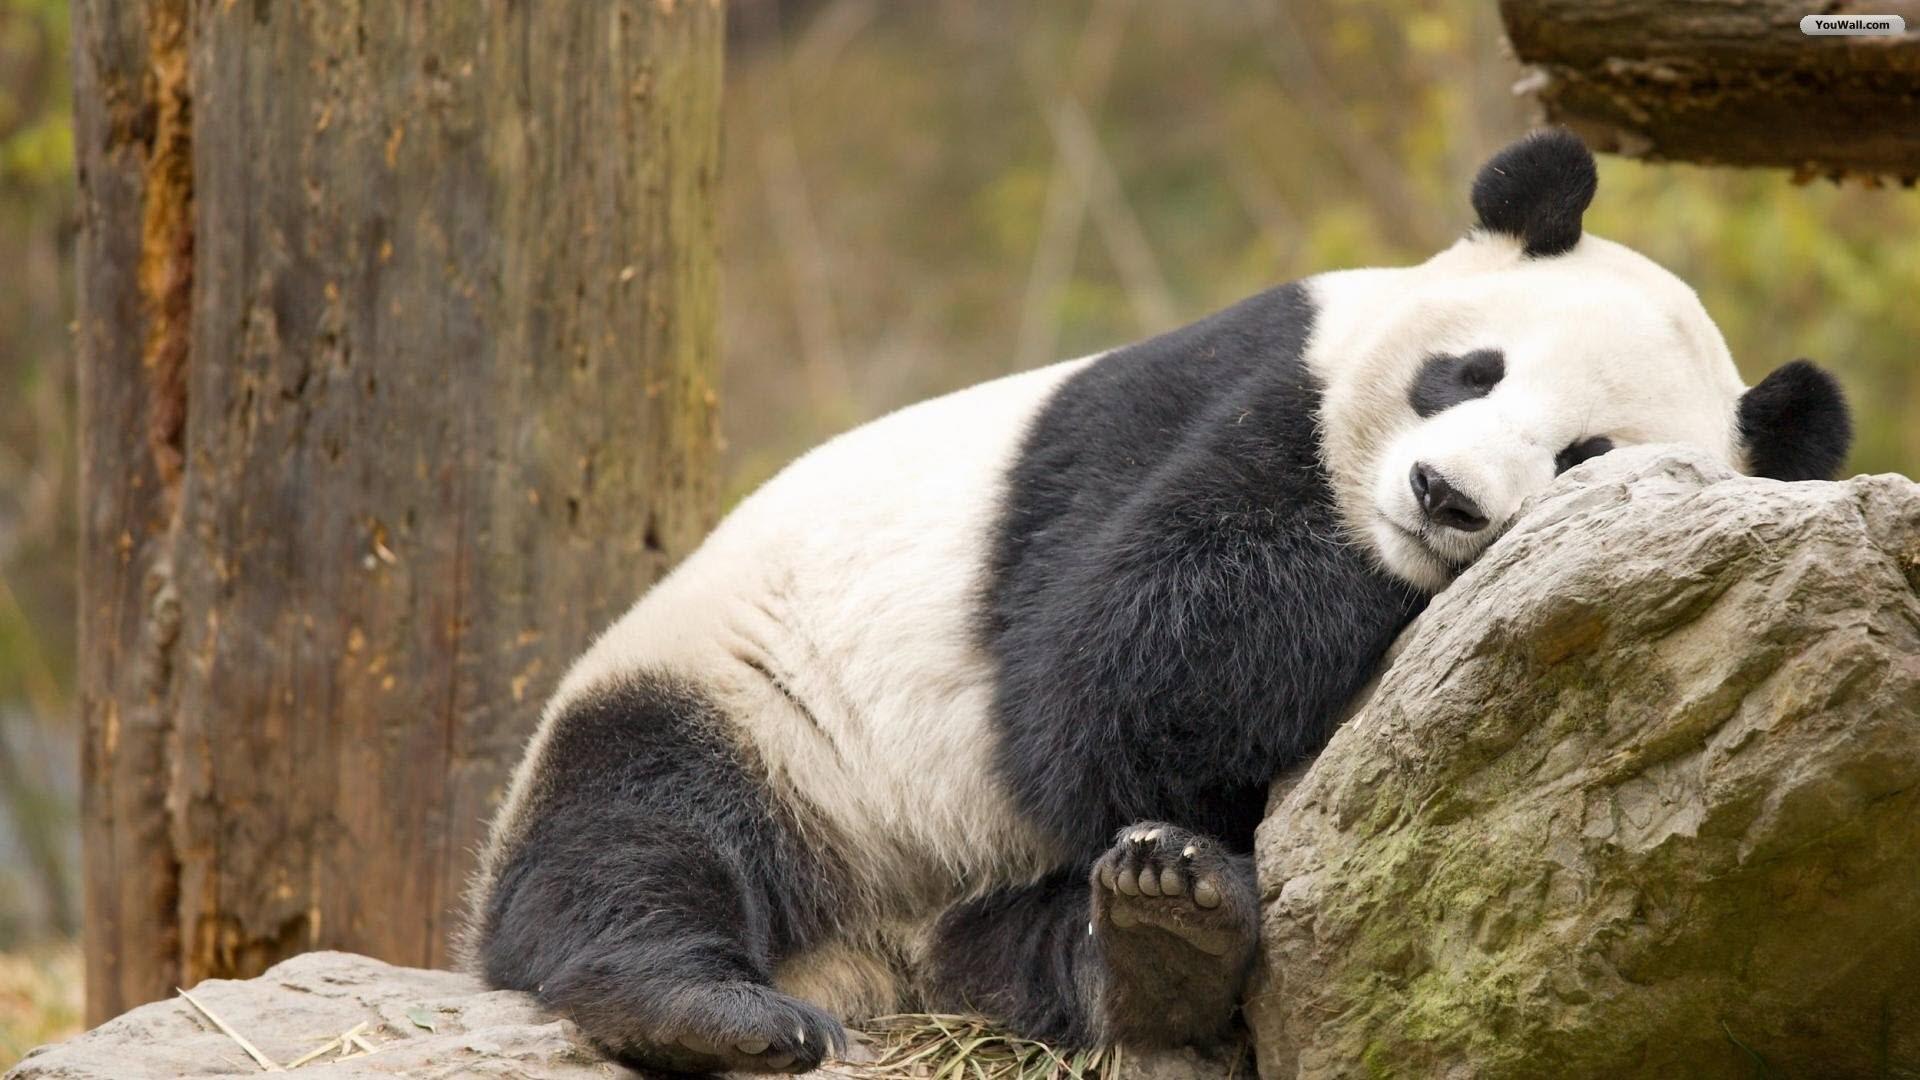 hinh gau truc panda 50